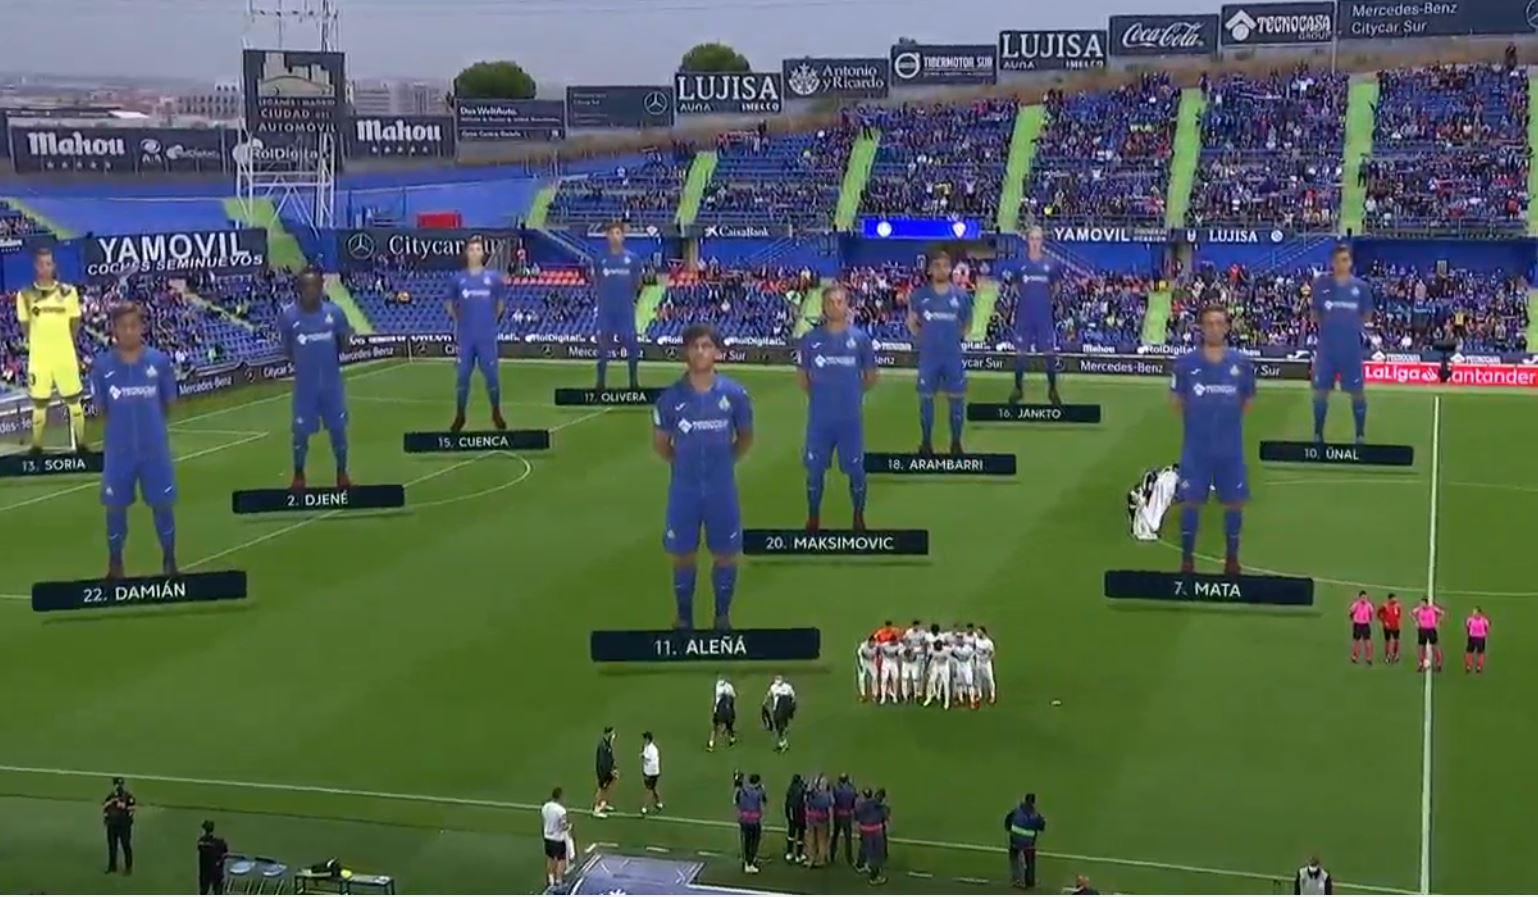 Getafe 0-1 Elche 2021.09.13 (19h00) Full Goals Highlight